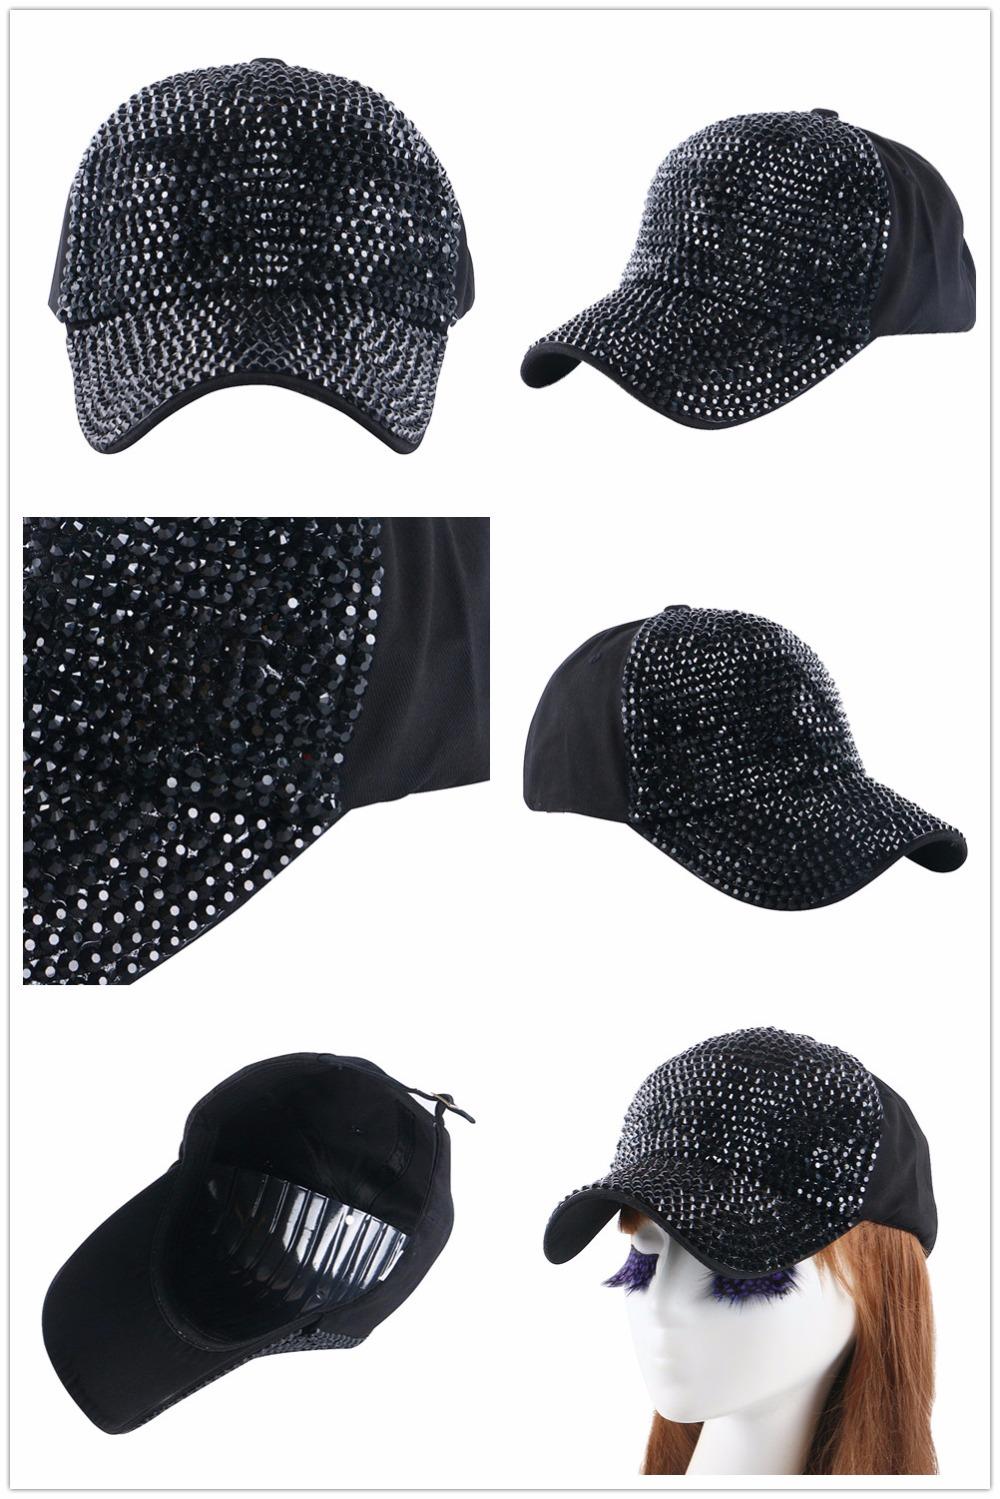 High Quality WOMEN brand baseball cap new fashion rhinestone crystal denim snapback caps wholesale woman hip hop snapbacks hats 7